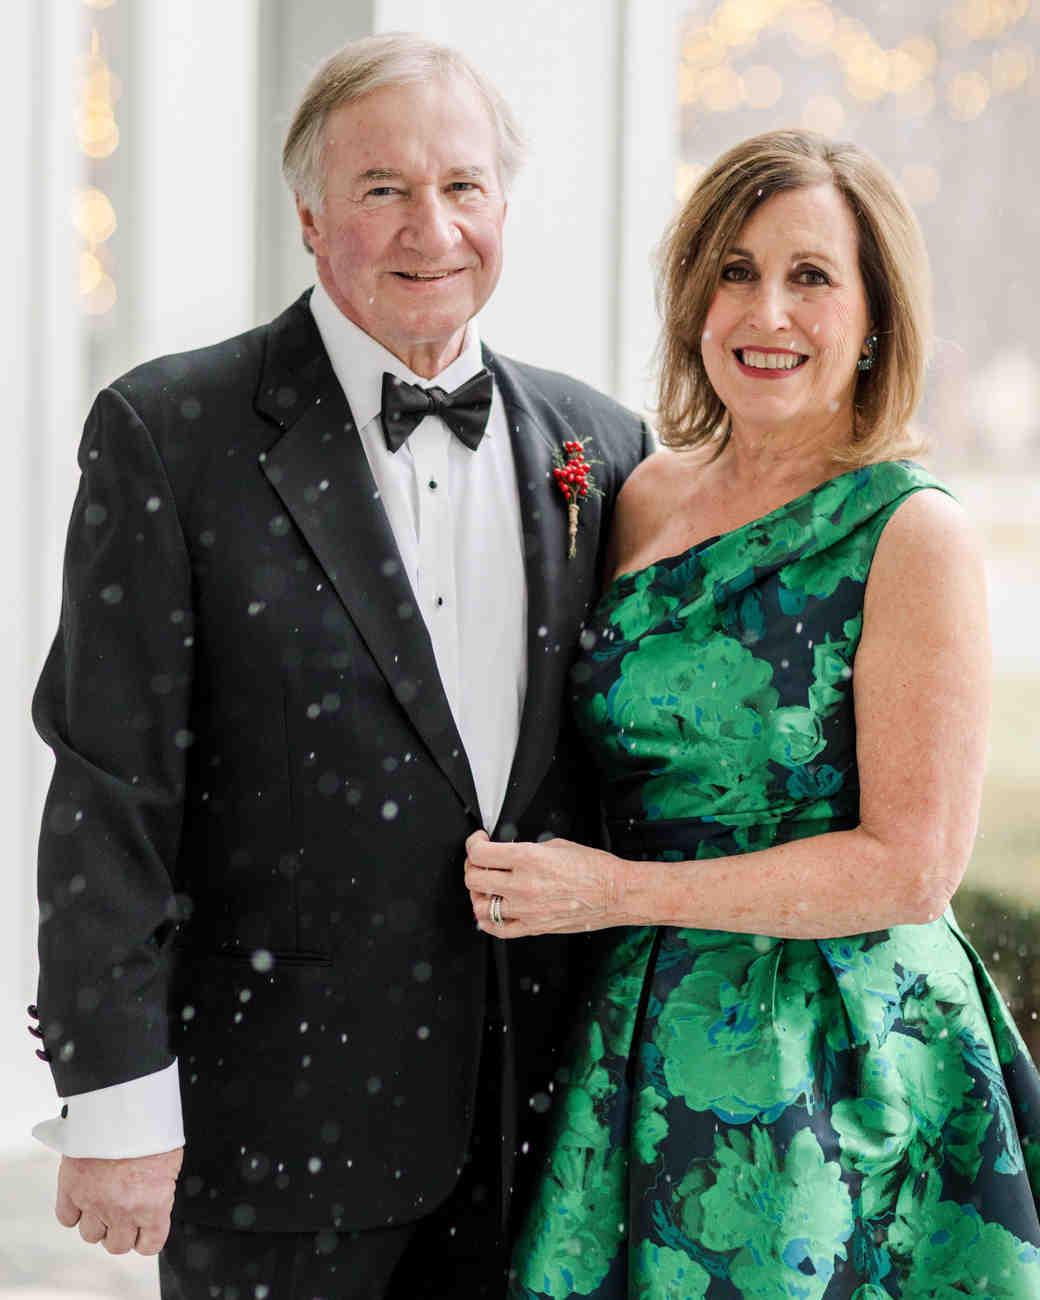 lauren christian christmas wedding parents